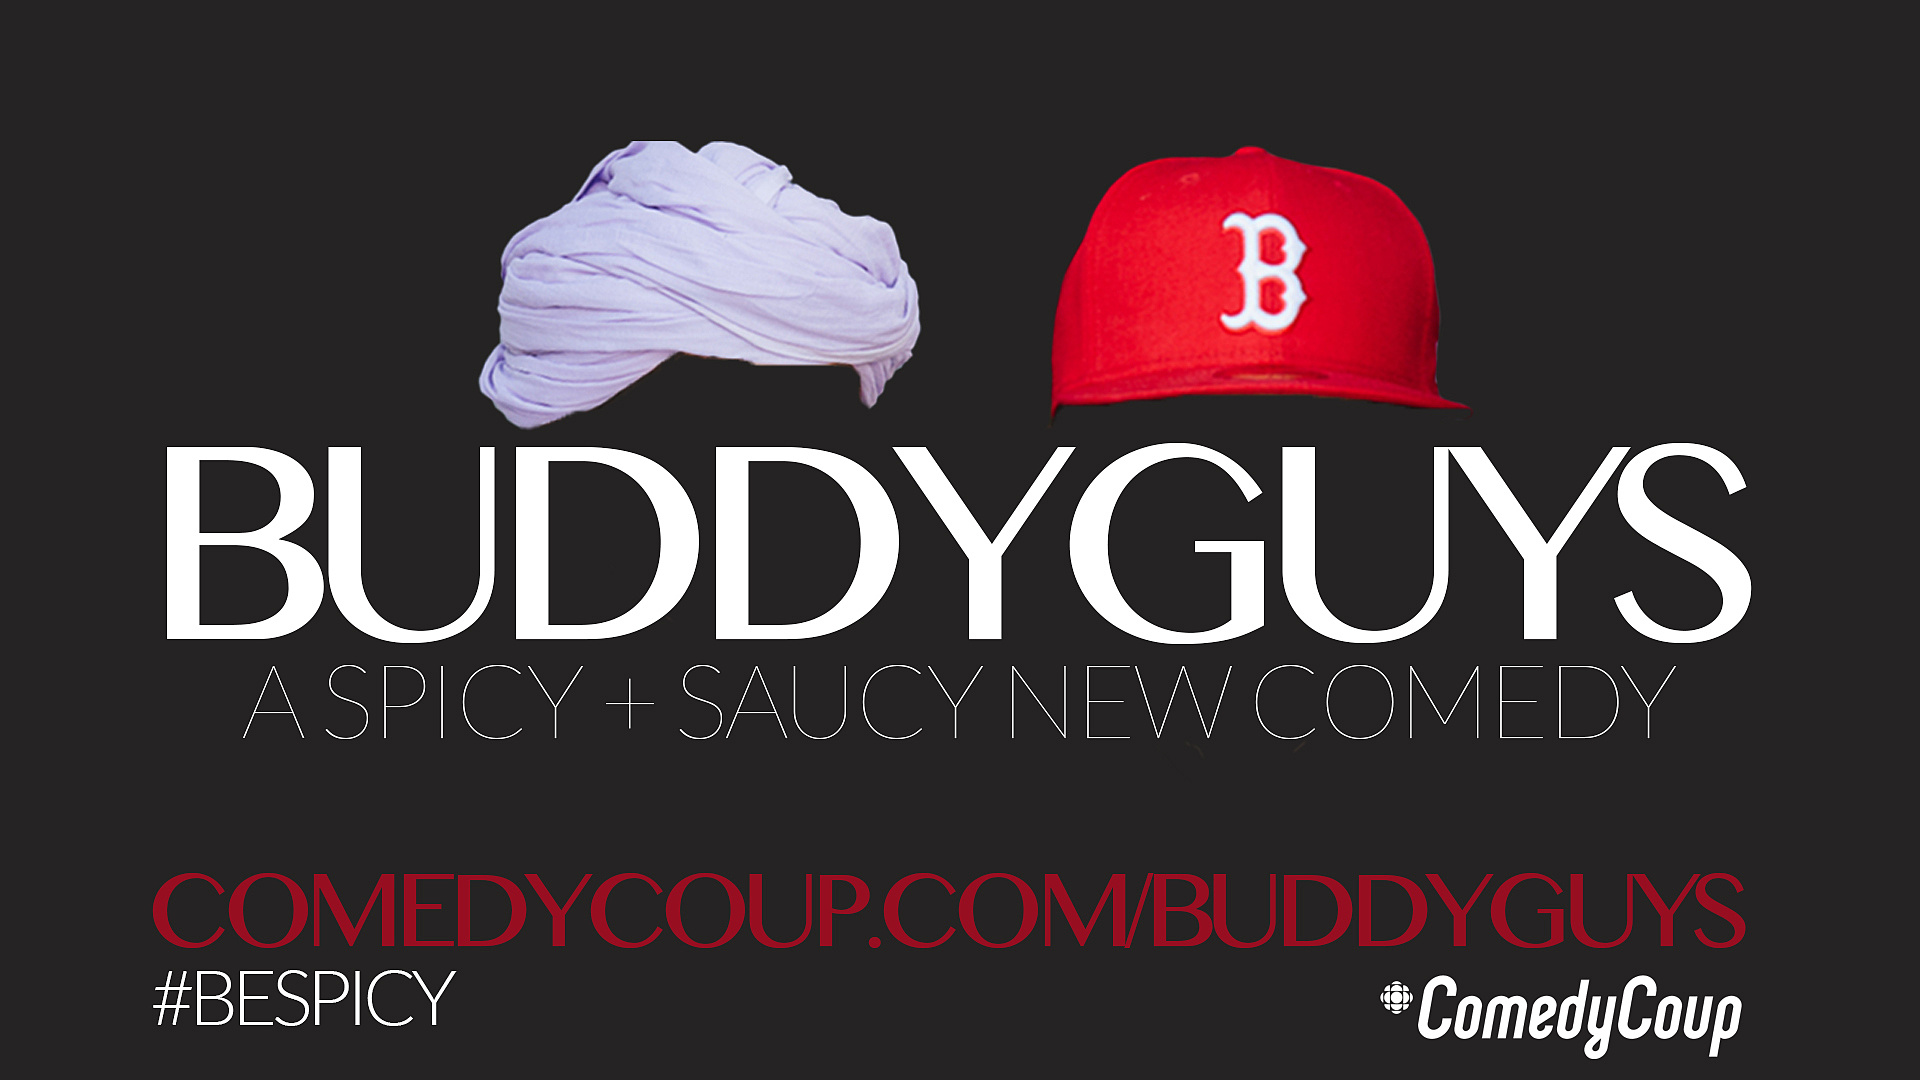 Week 4 Key It: Poster A Buddy Guys